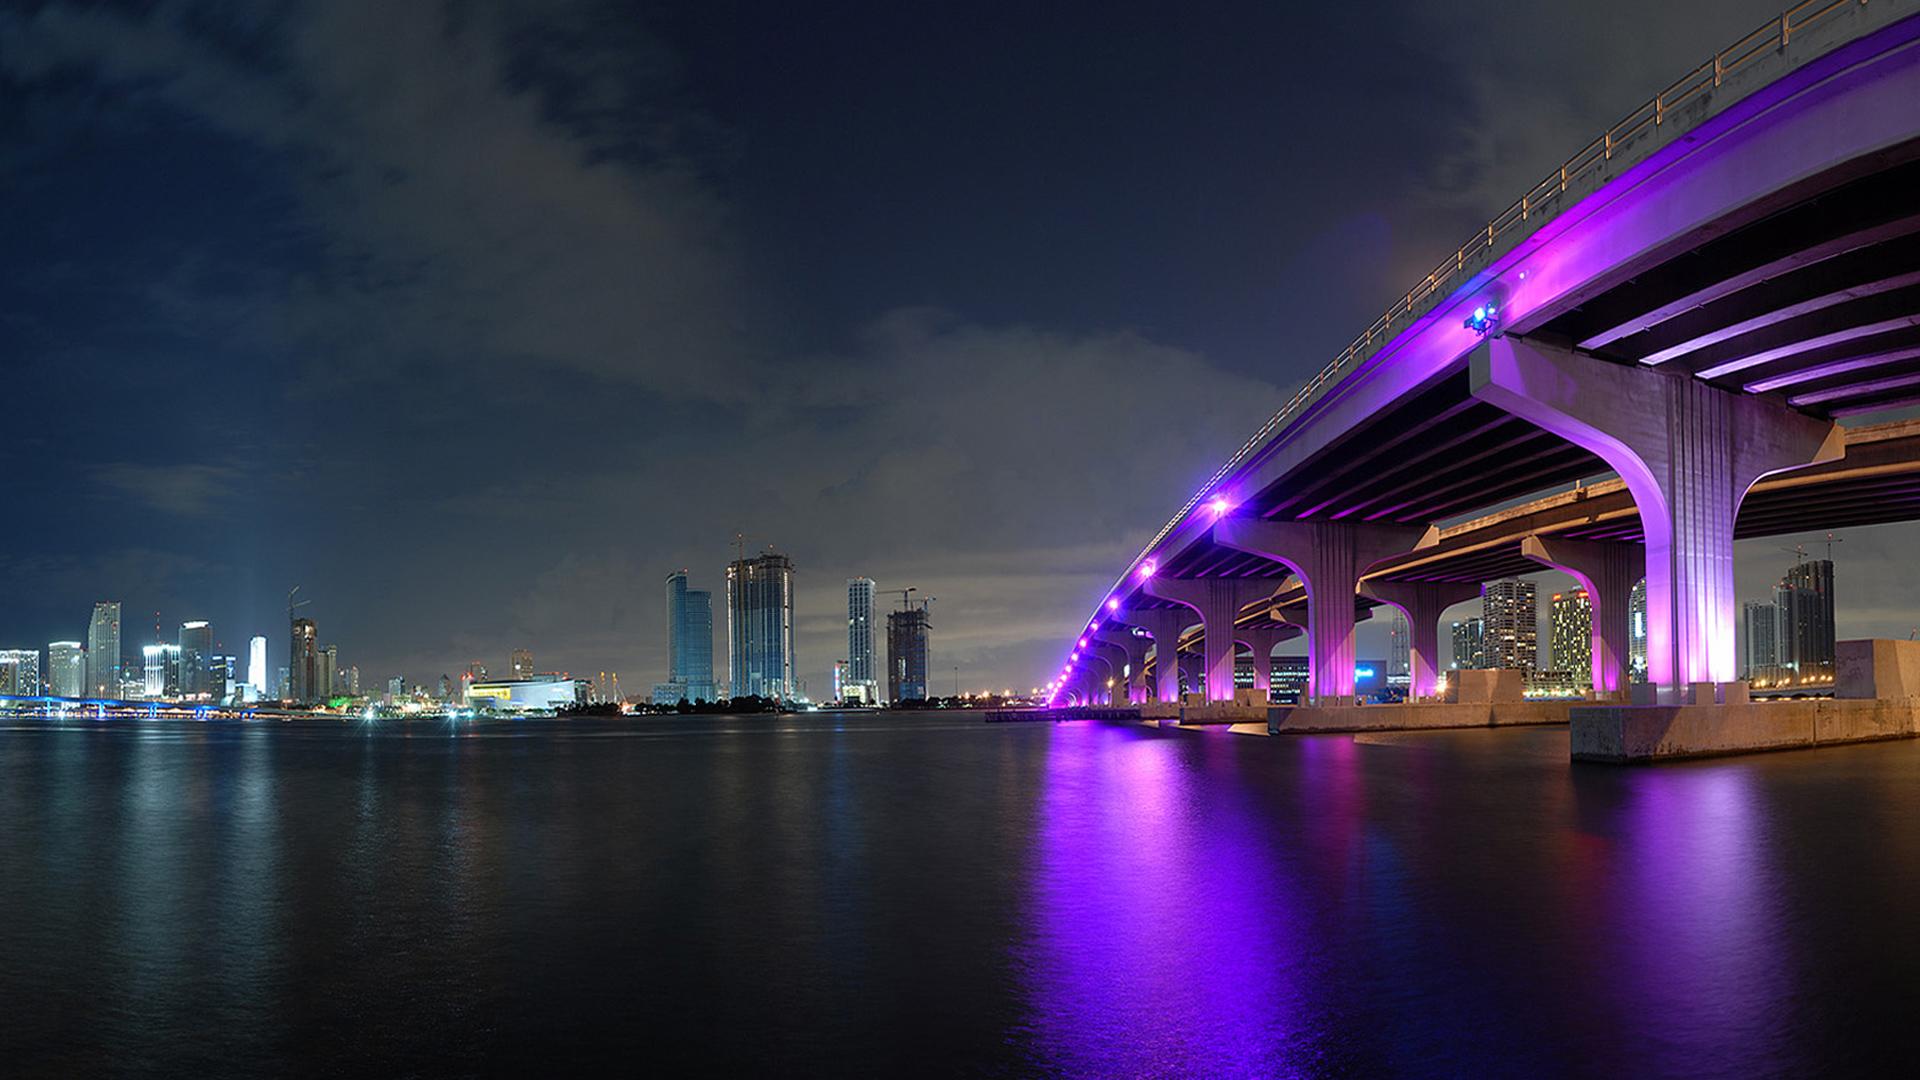 Hd wallpaper city - Miami City Wallpapers Hd Wallpapers